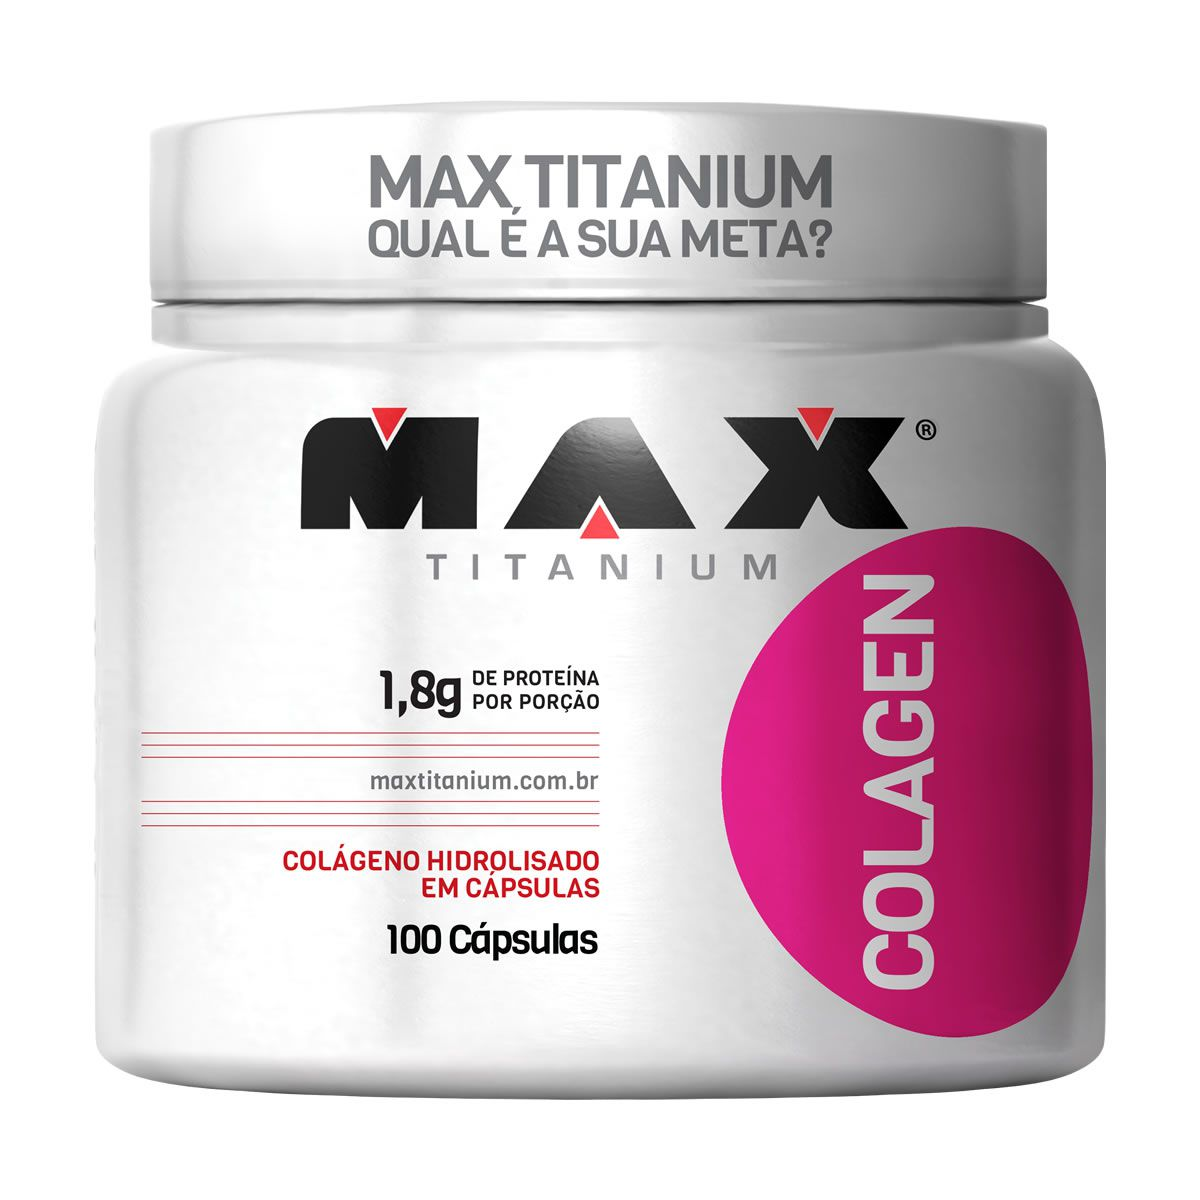 Colagen 100 Cápsulas Colágeno Max Titanium